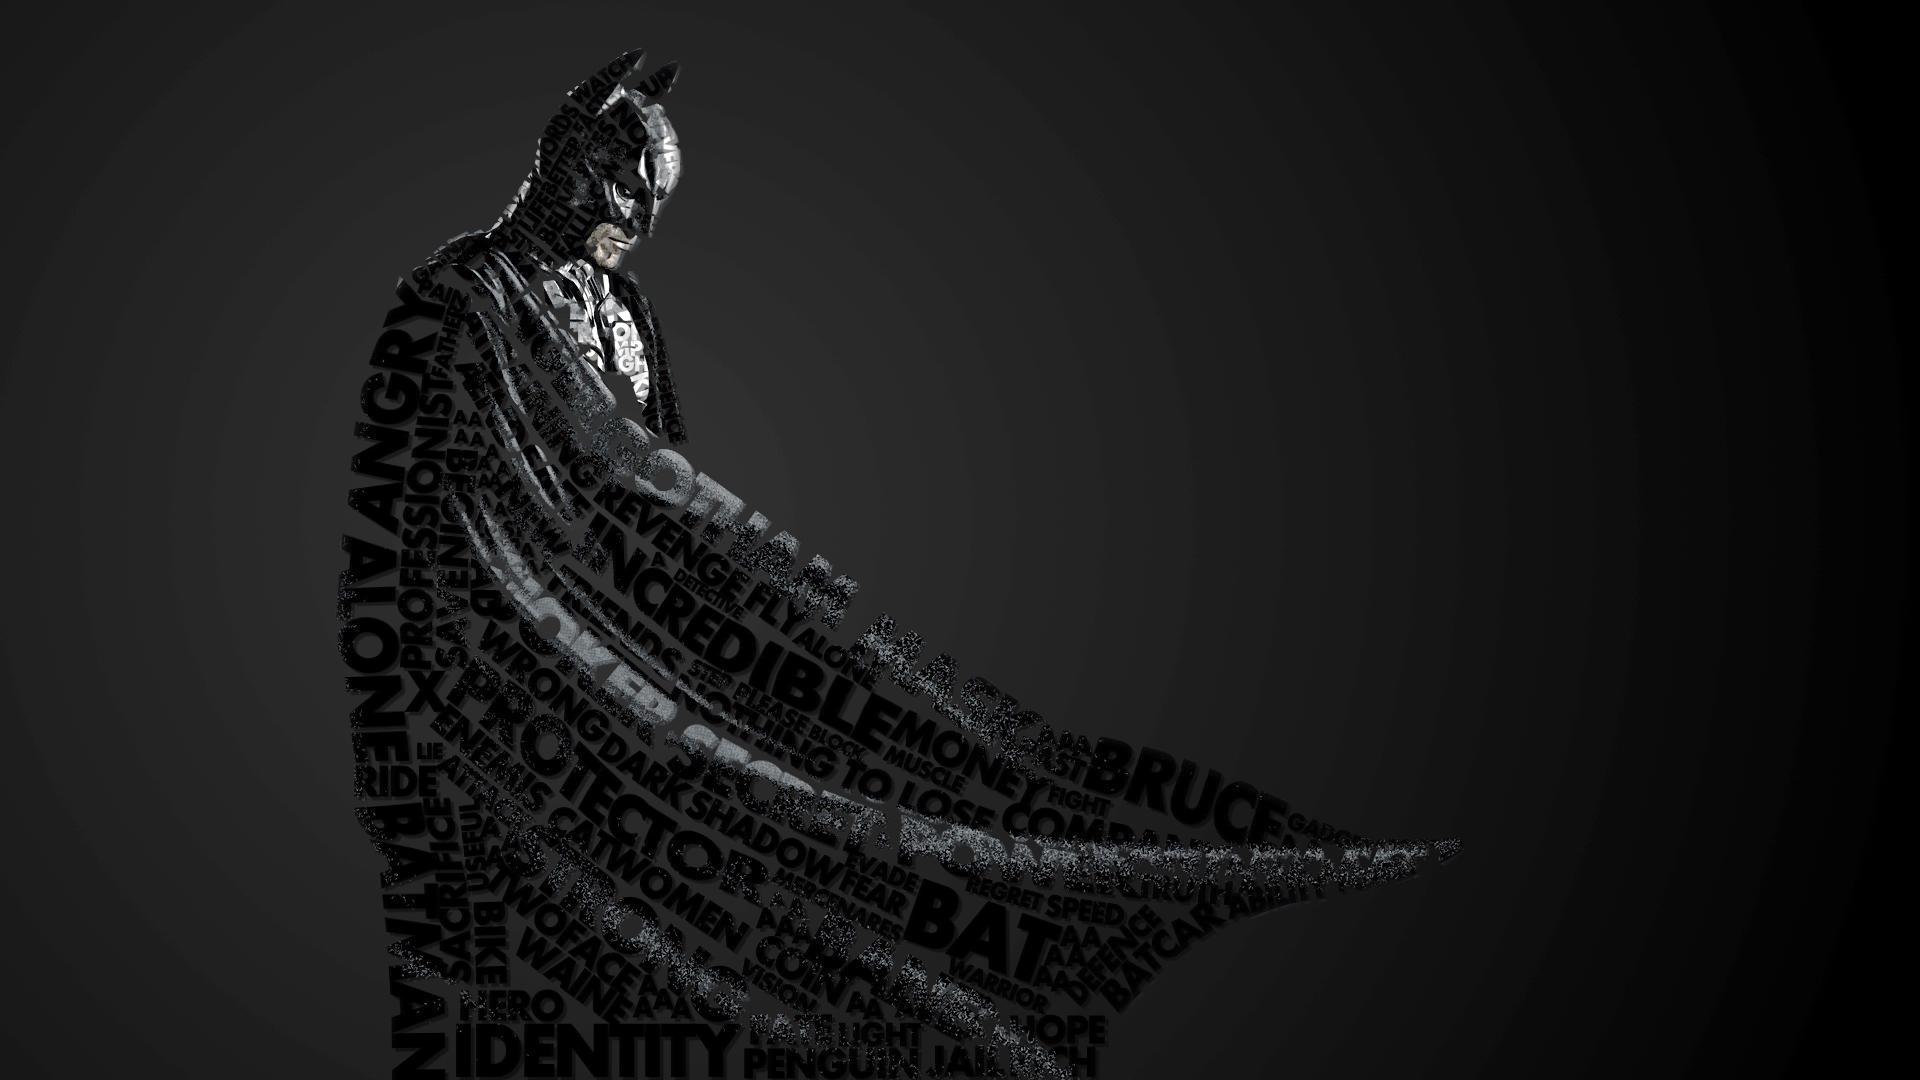 batman beyond hd wallpapers 1080p viewing gallery